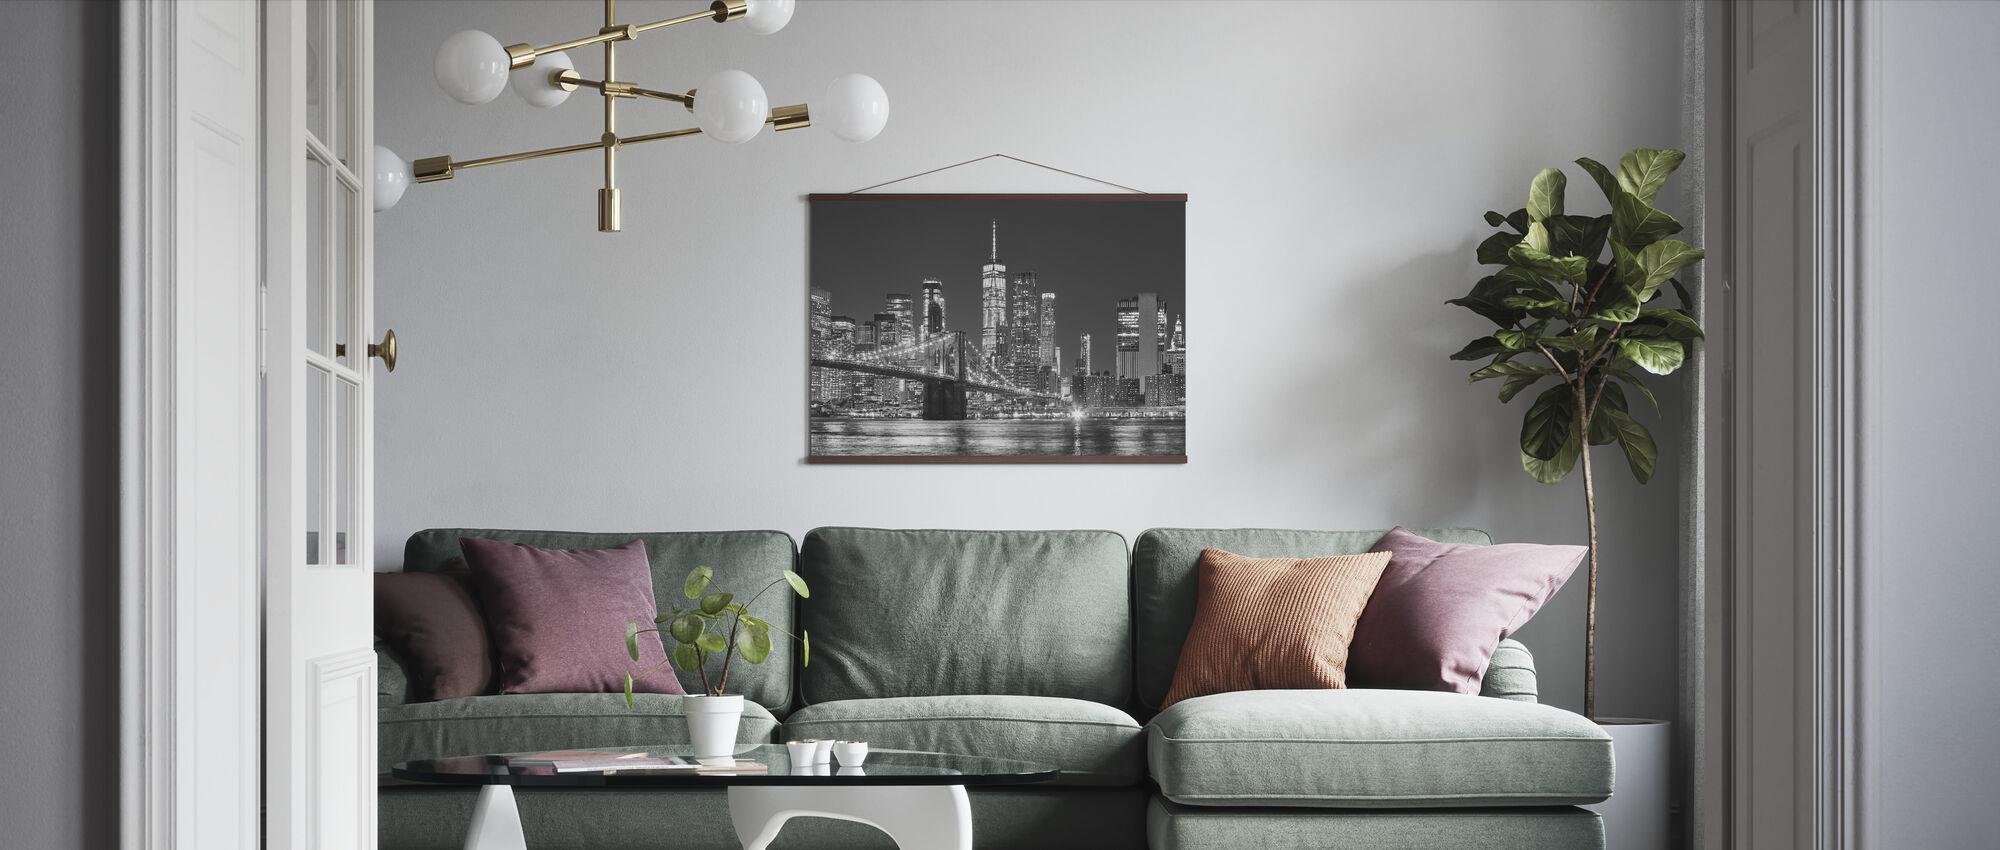 Manhattan Skyline at Night - Poster - Living Room